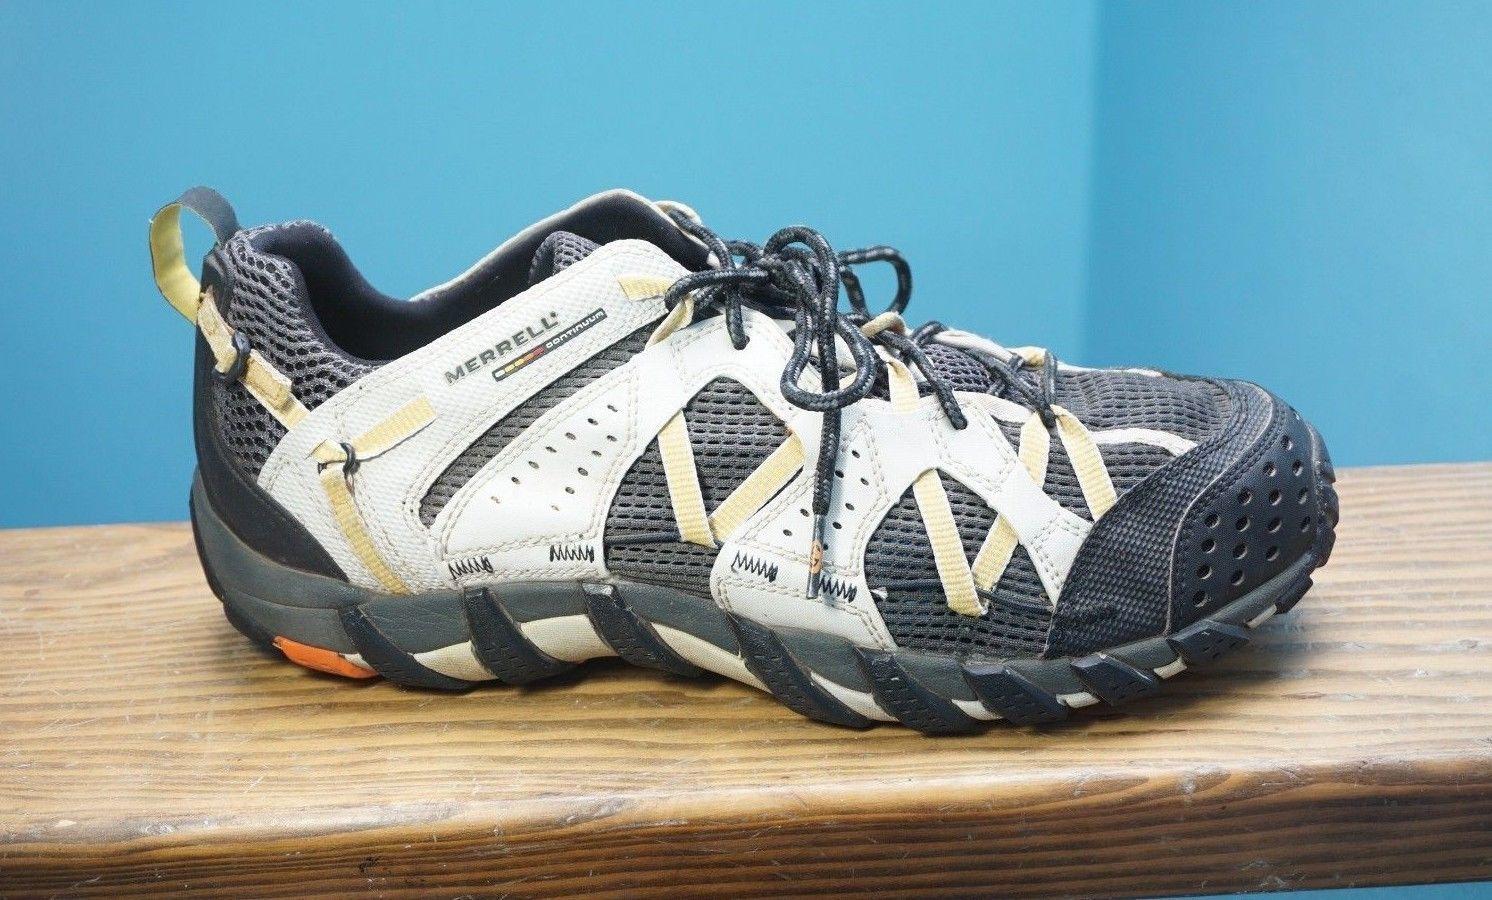 2225a8f155d9 Men s Merrell Waterpro Maipo White Charcoal Yellow Water Shoes Hiking 11  Nice!